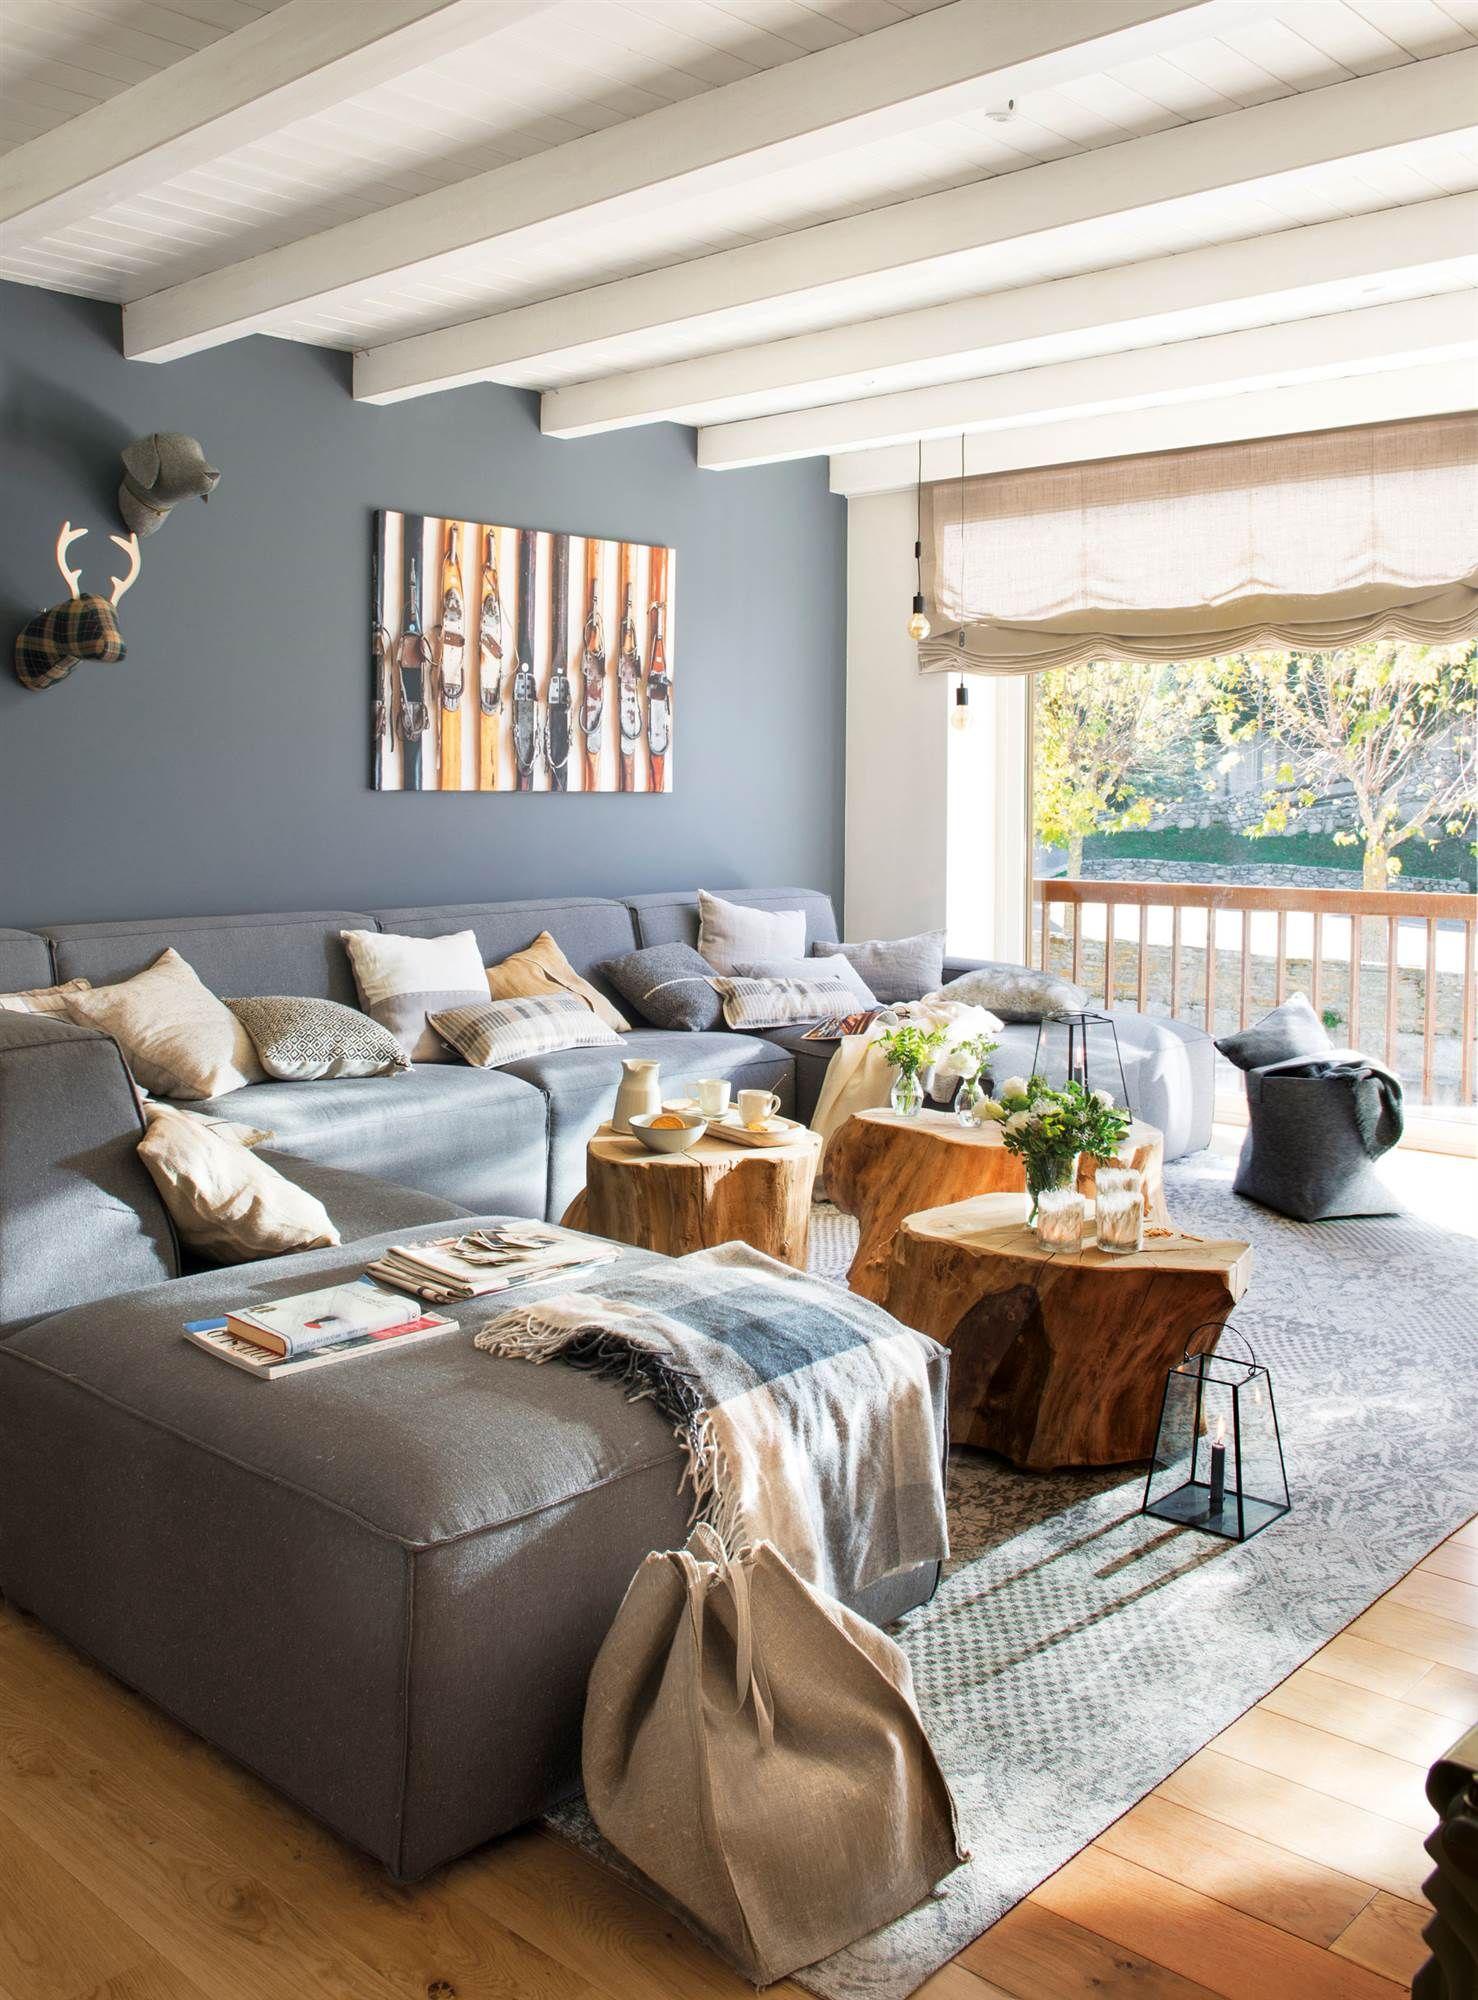 Qu muebles tendr s en 2019 habitaciones femeninas - Muebles grises paredes color ...